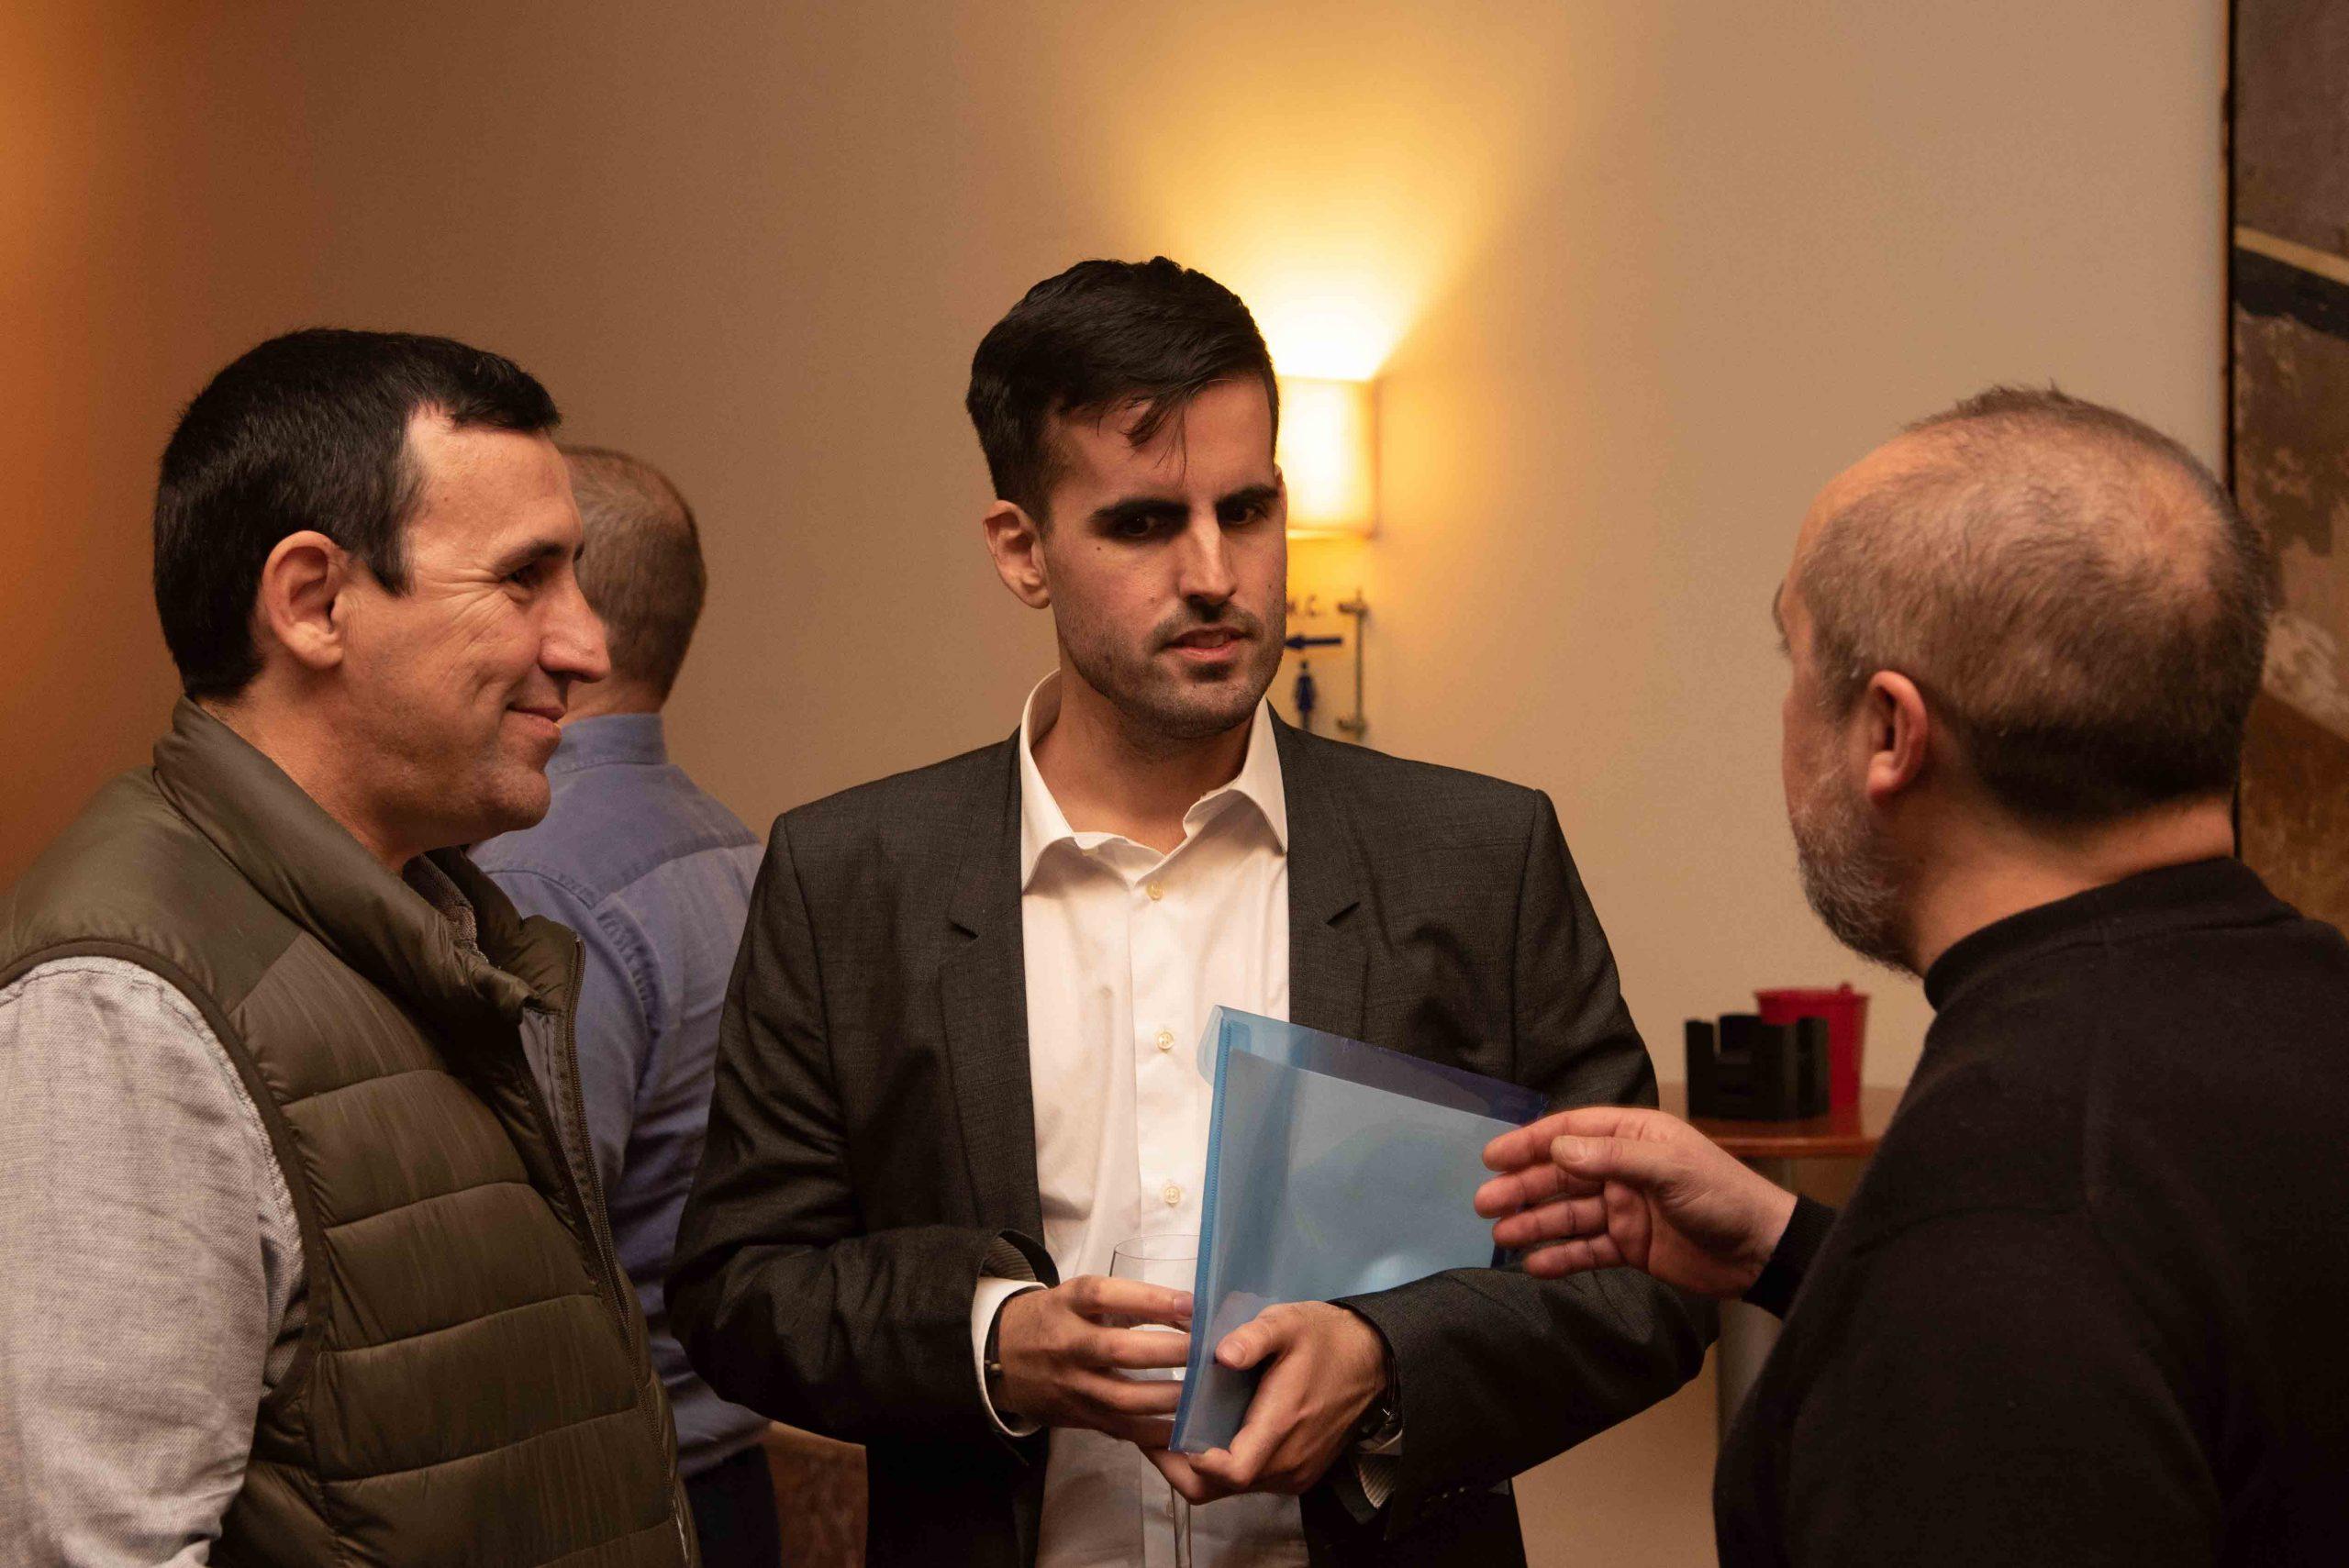 Victor Alvarez trader estratega en Quantgemfx